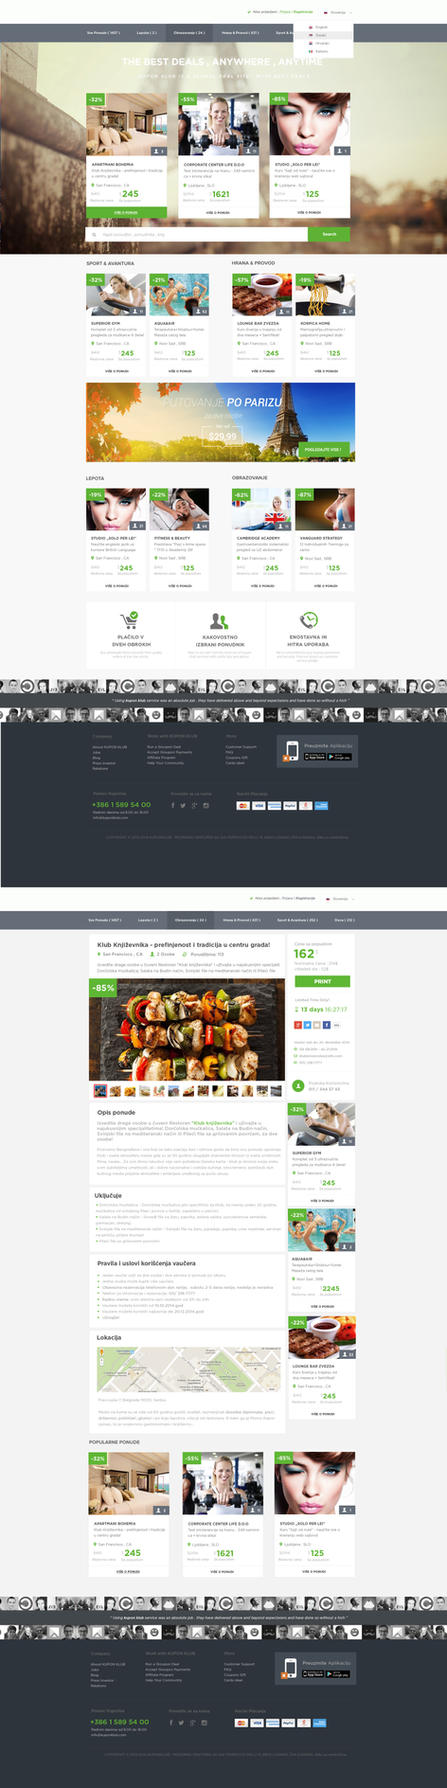 KlubPlus Coupon Web Design by vasiligfx